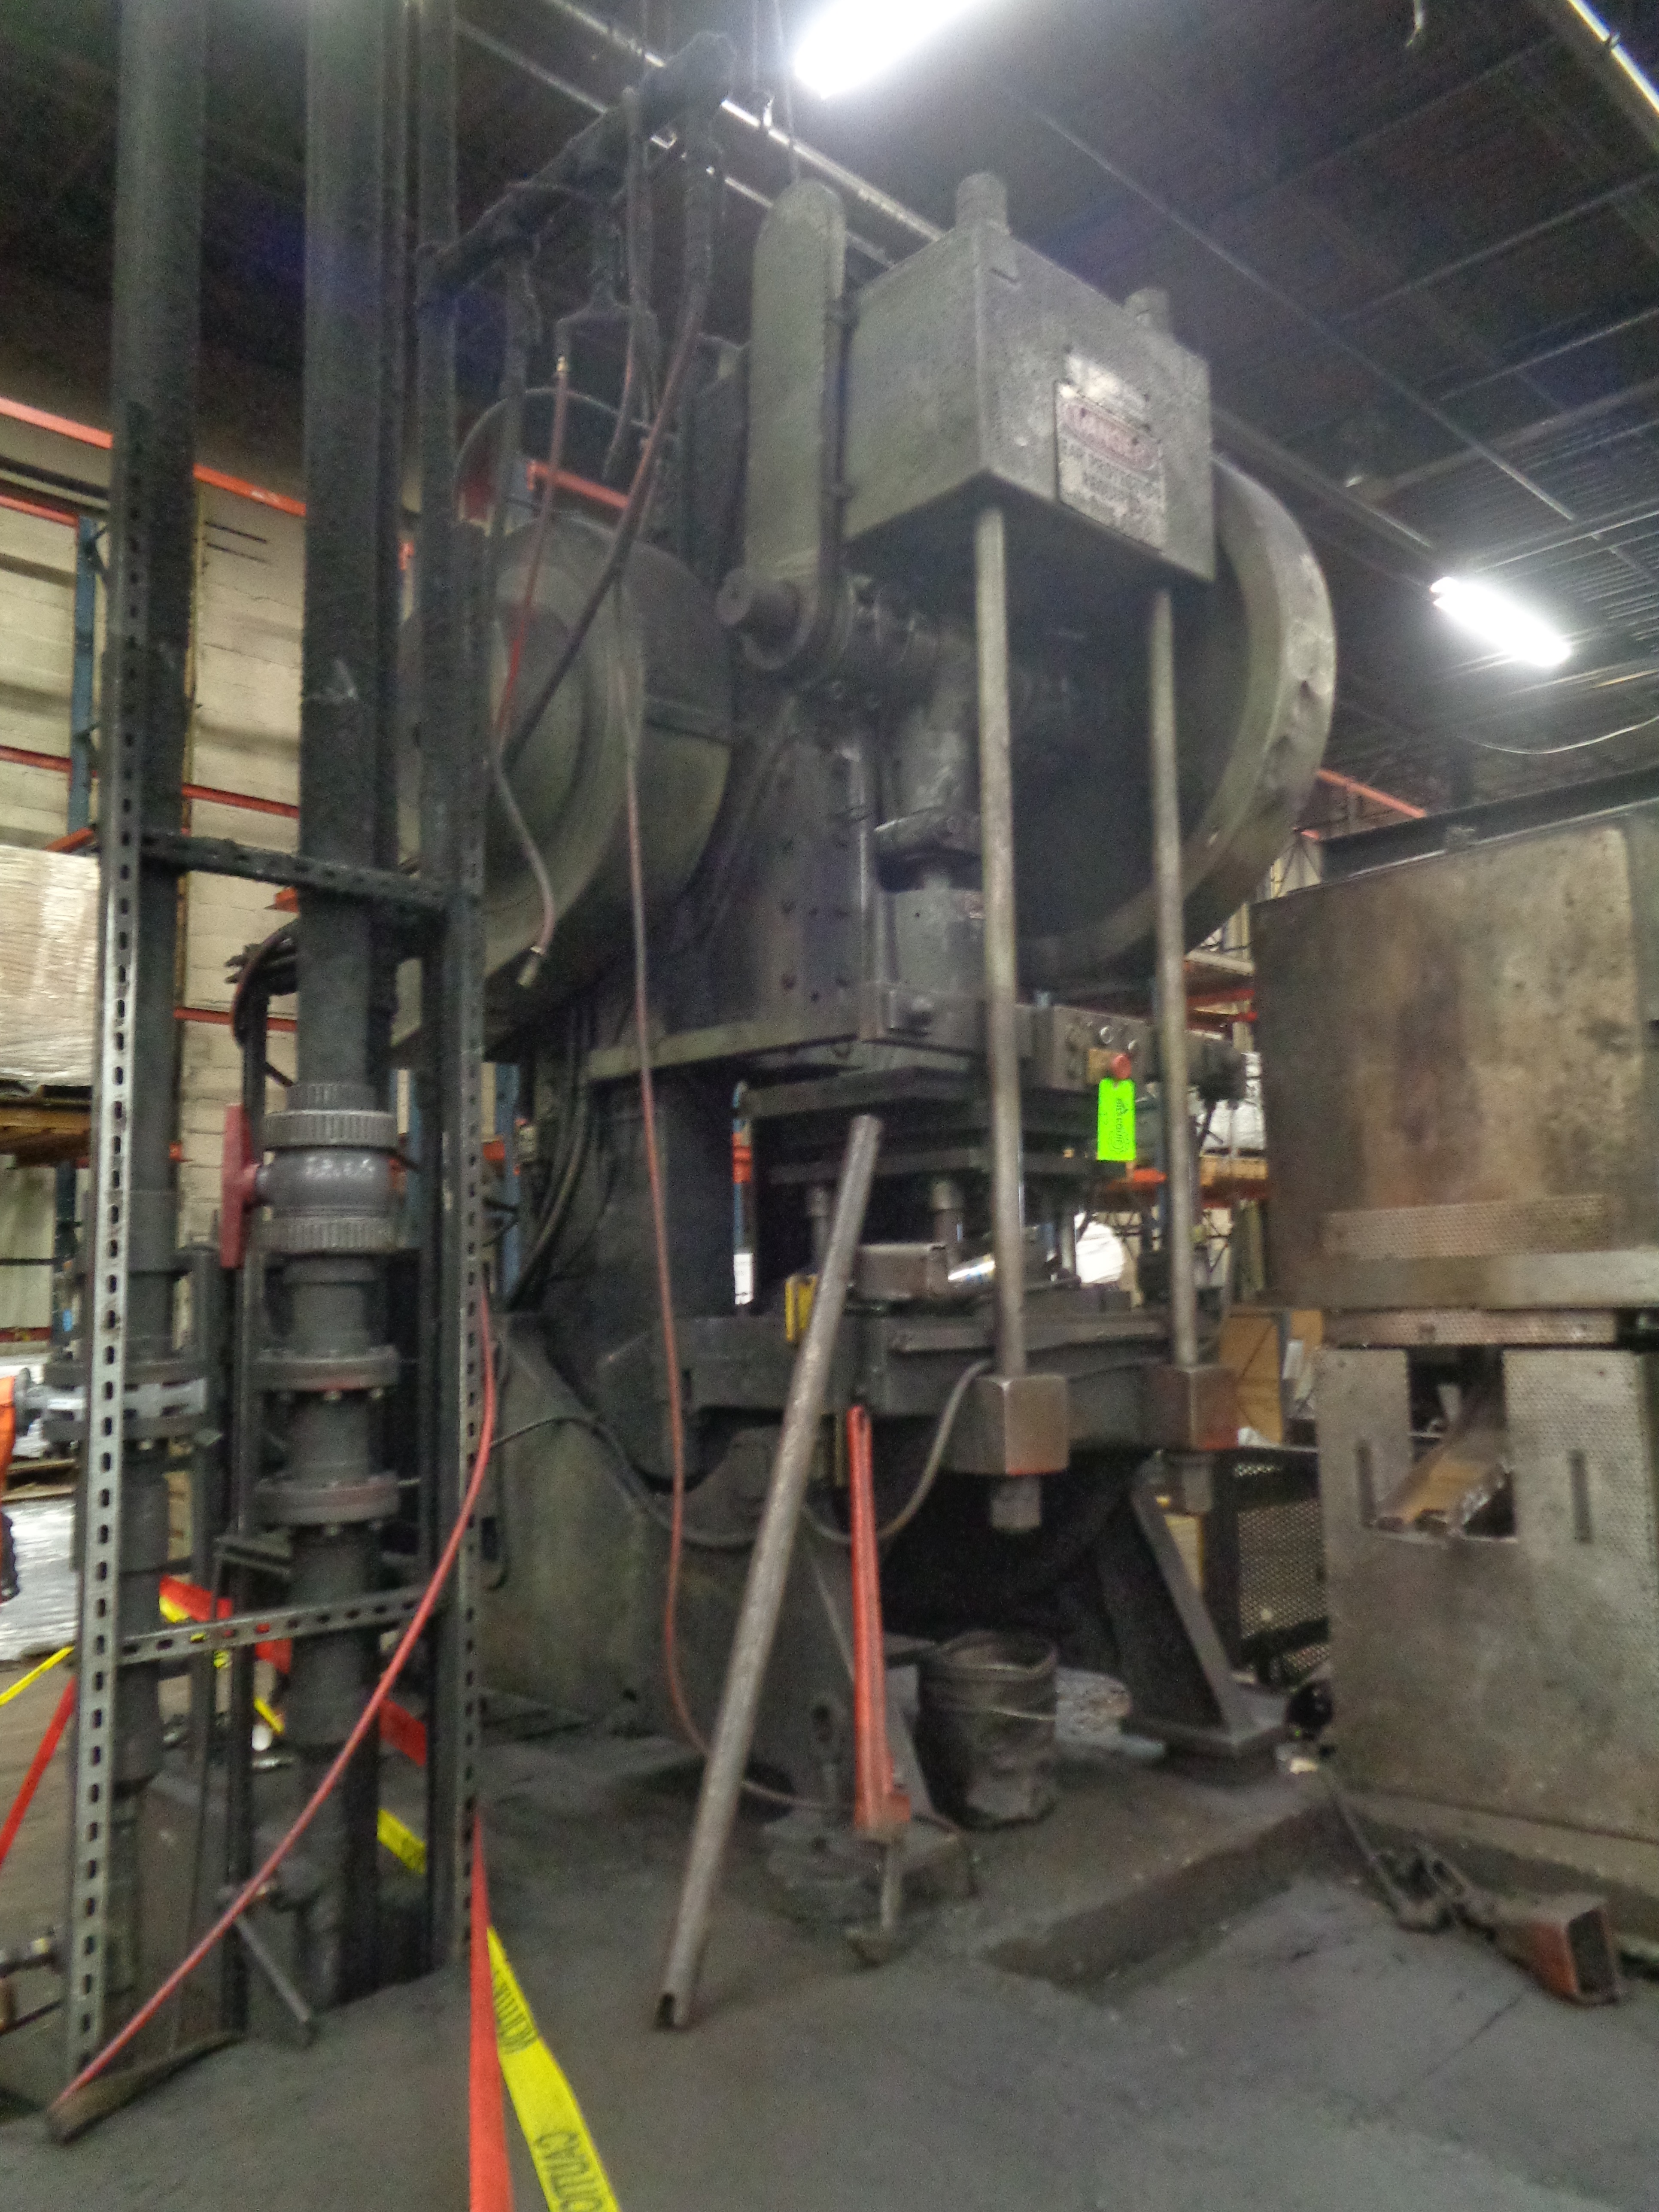 South Bend Press 125 Ton Located in Swedsboro NJ - Image 5 of 6